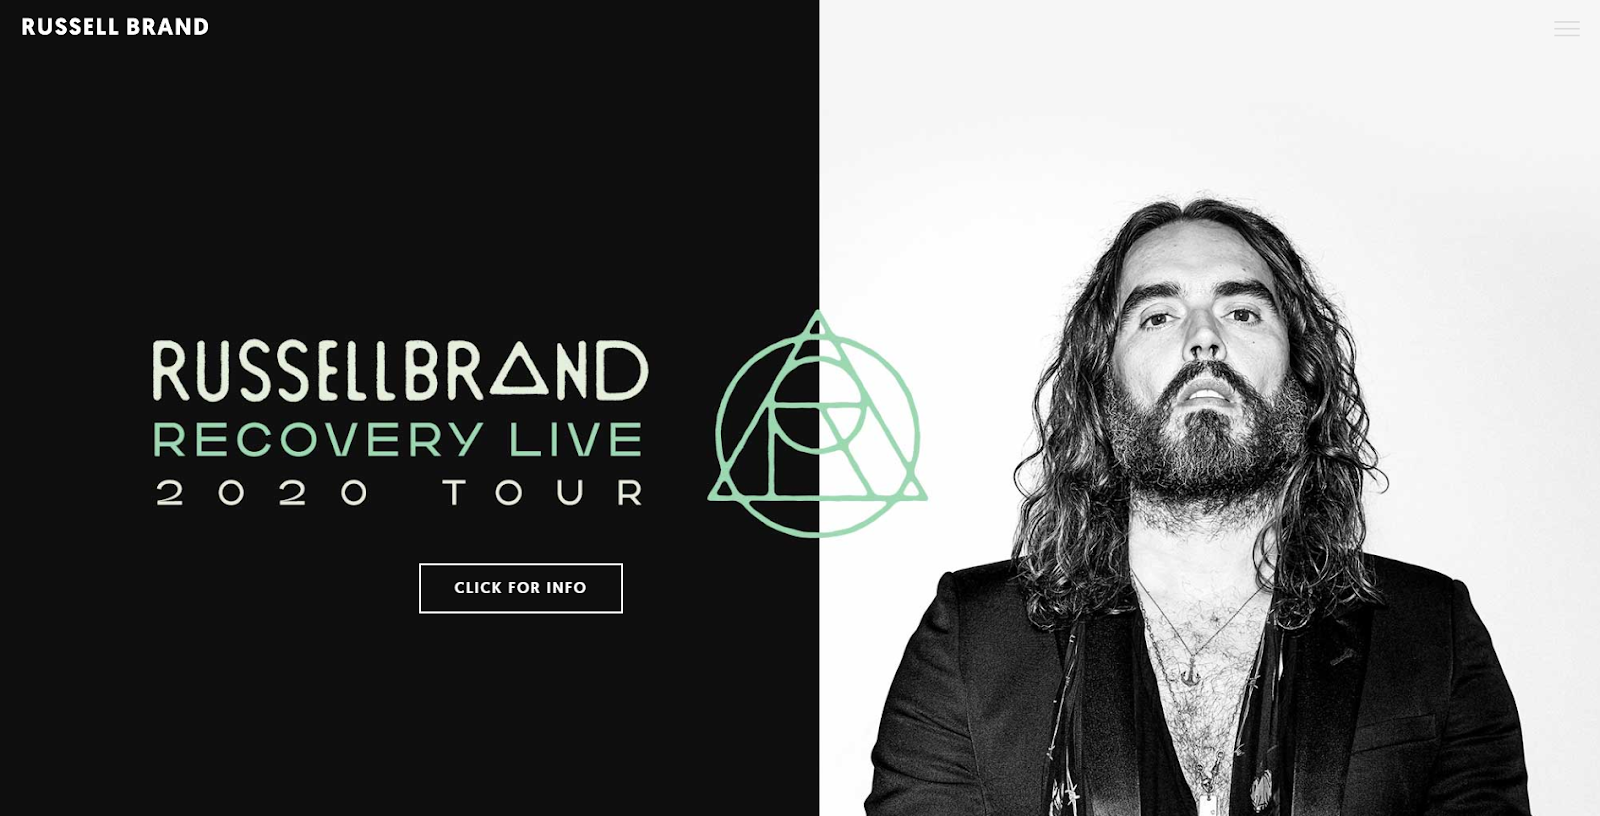 Russel Brand's personal website